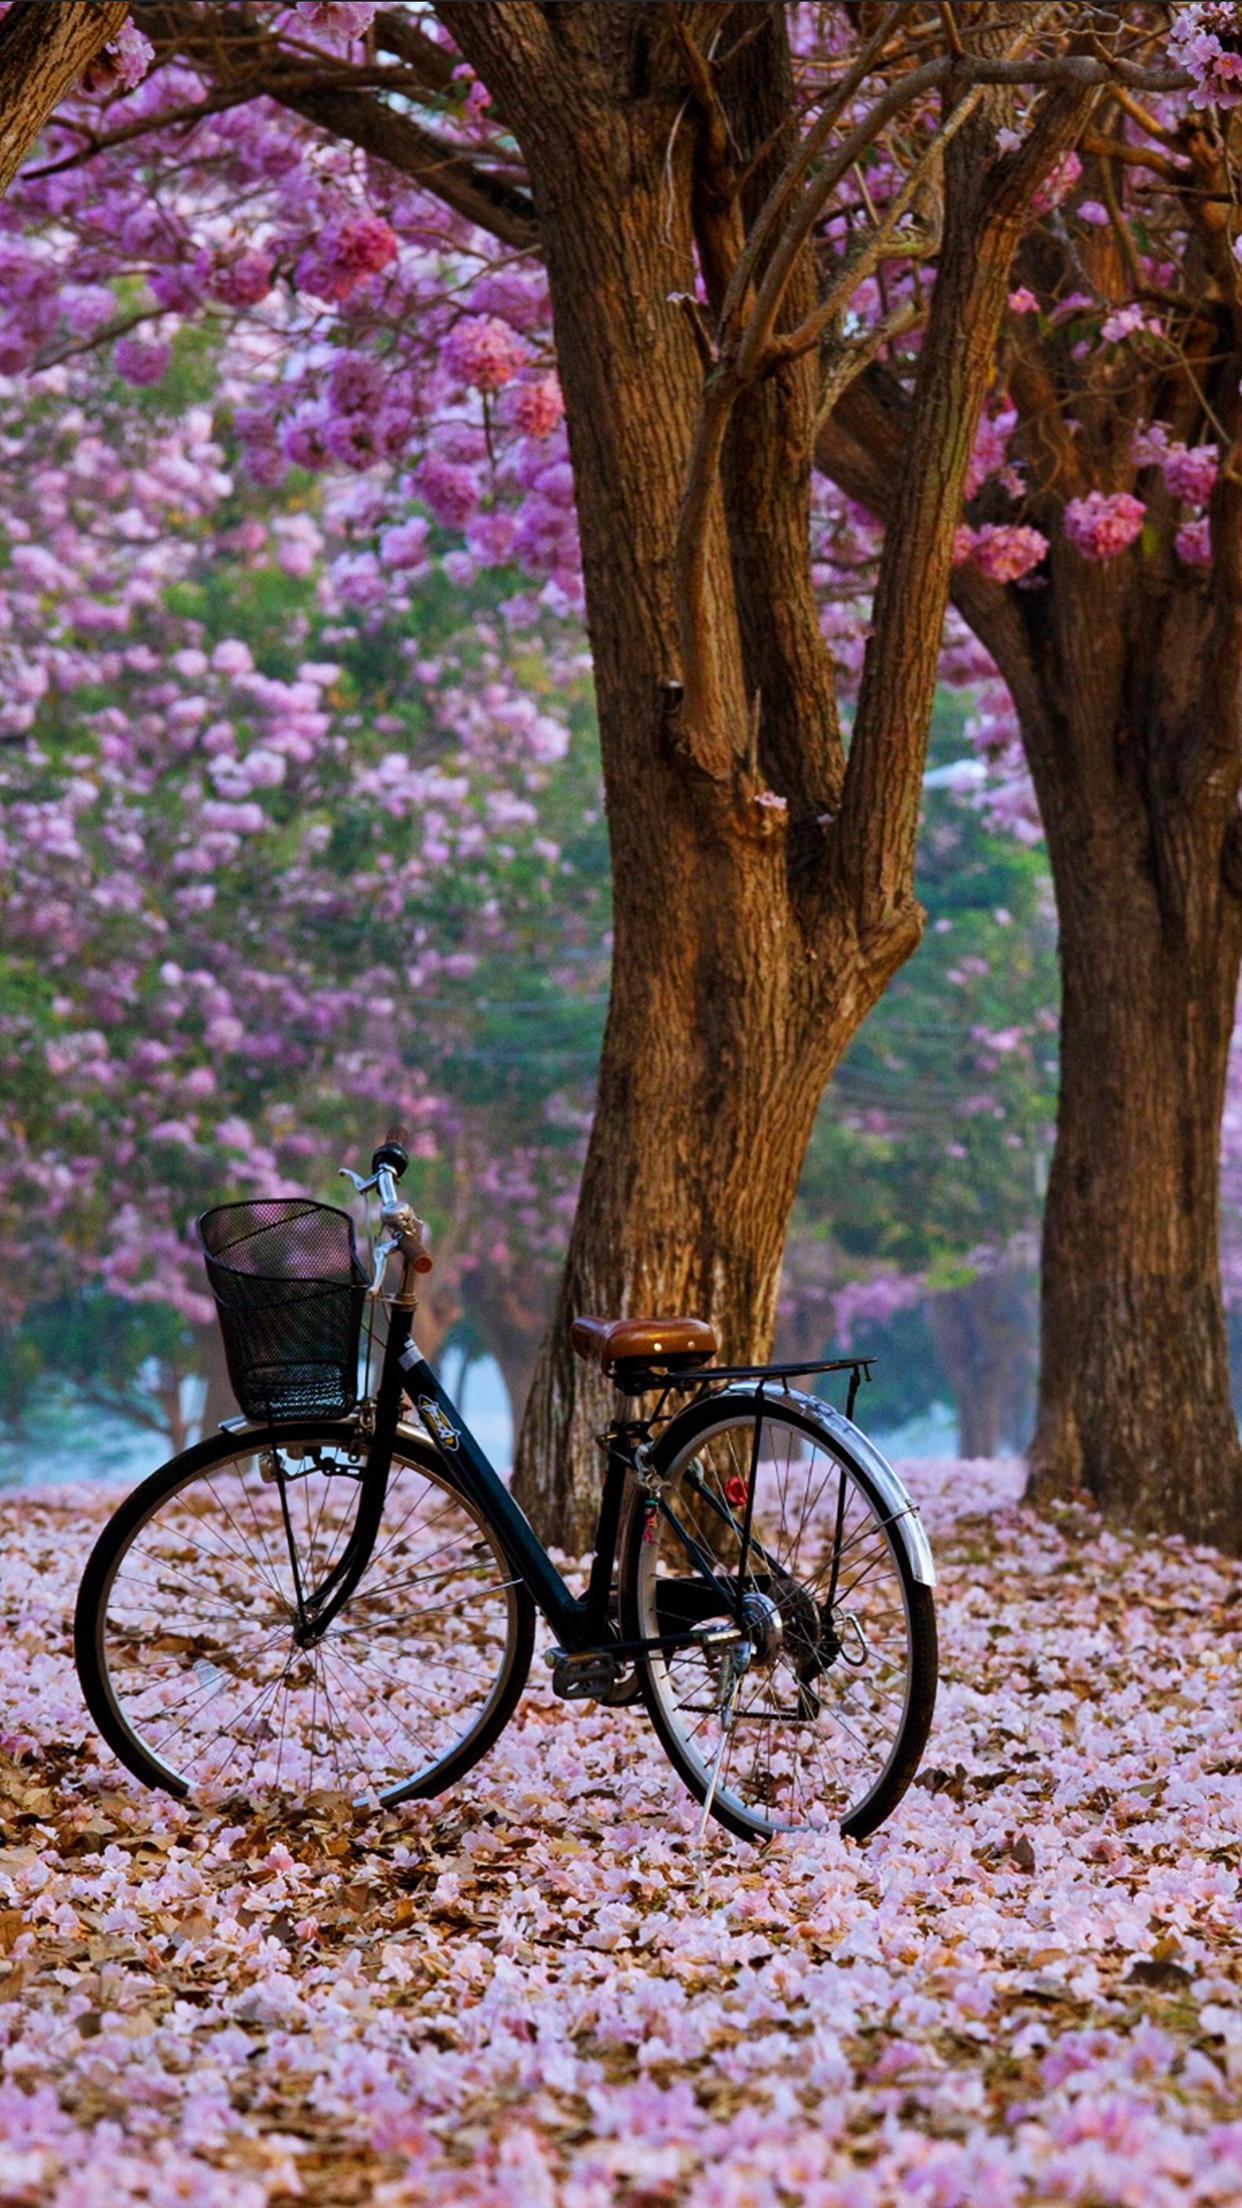 Spring Bike 3Wallpapers iPhone Parallax Spring : Bike